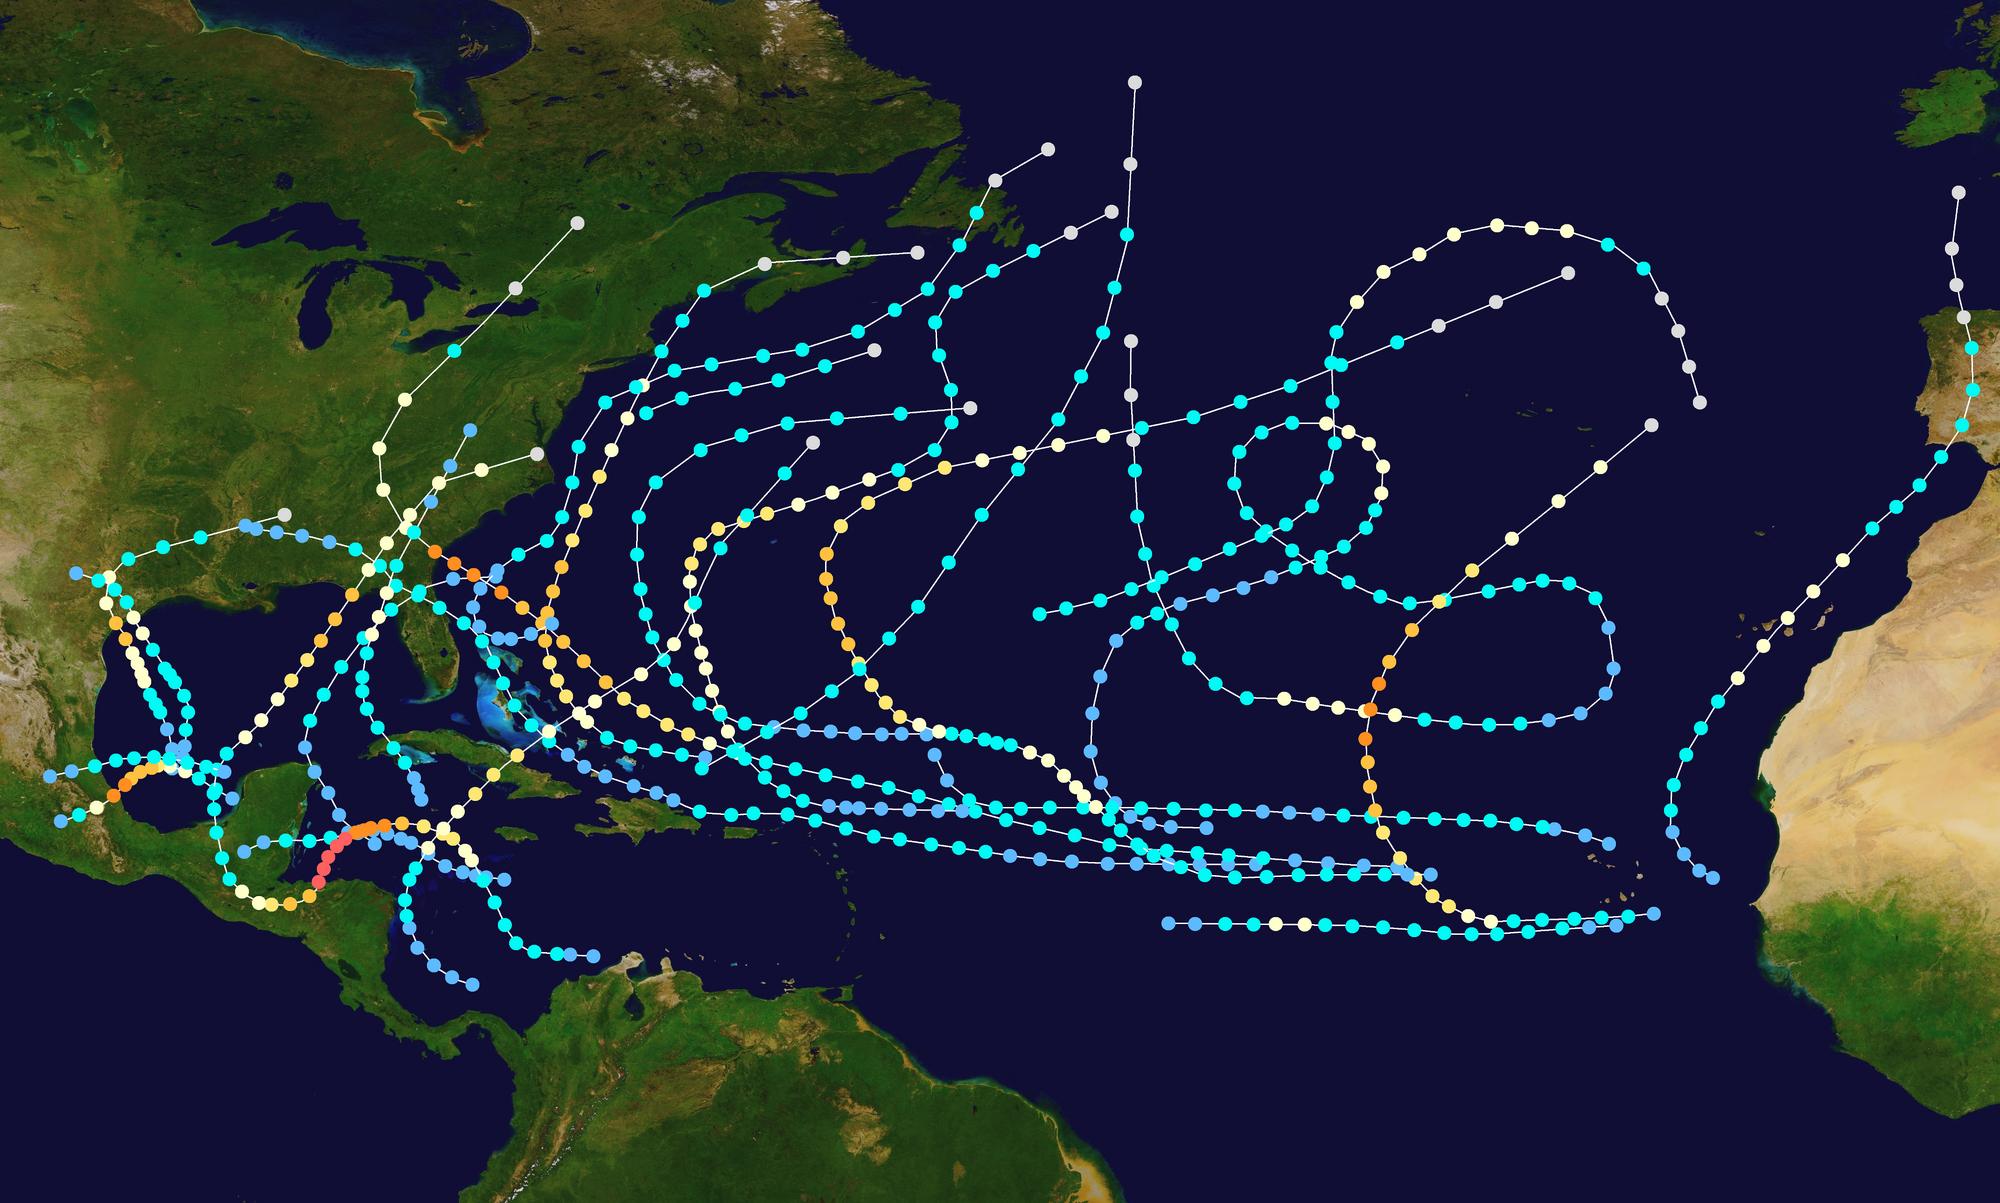 Us Weather Map Barometric Pressure%0A      Atlantic Hurricane Season  Garfield    Hypothetical Hurricanes Wiki    FANDOM powered by Wikia